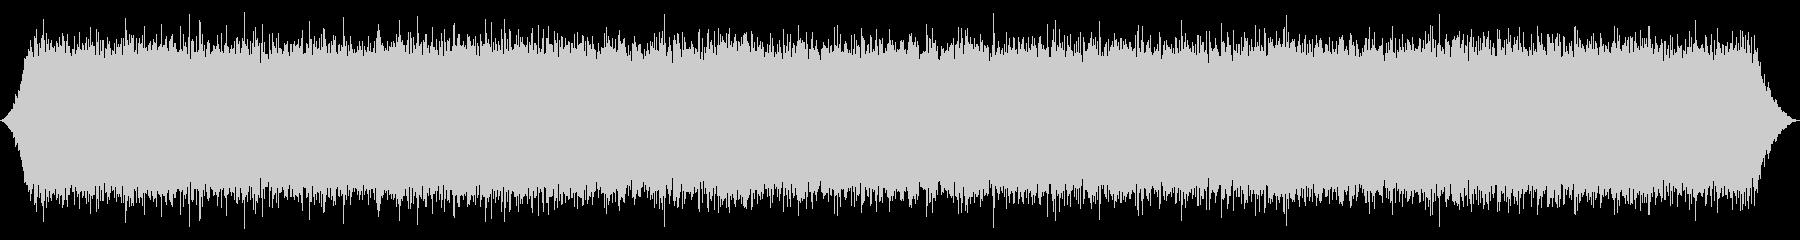 River:強力な低音とスプレーの未再生の波形